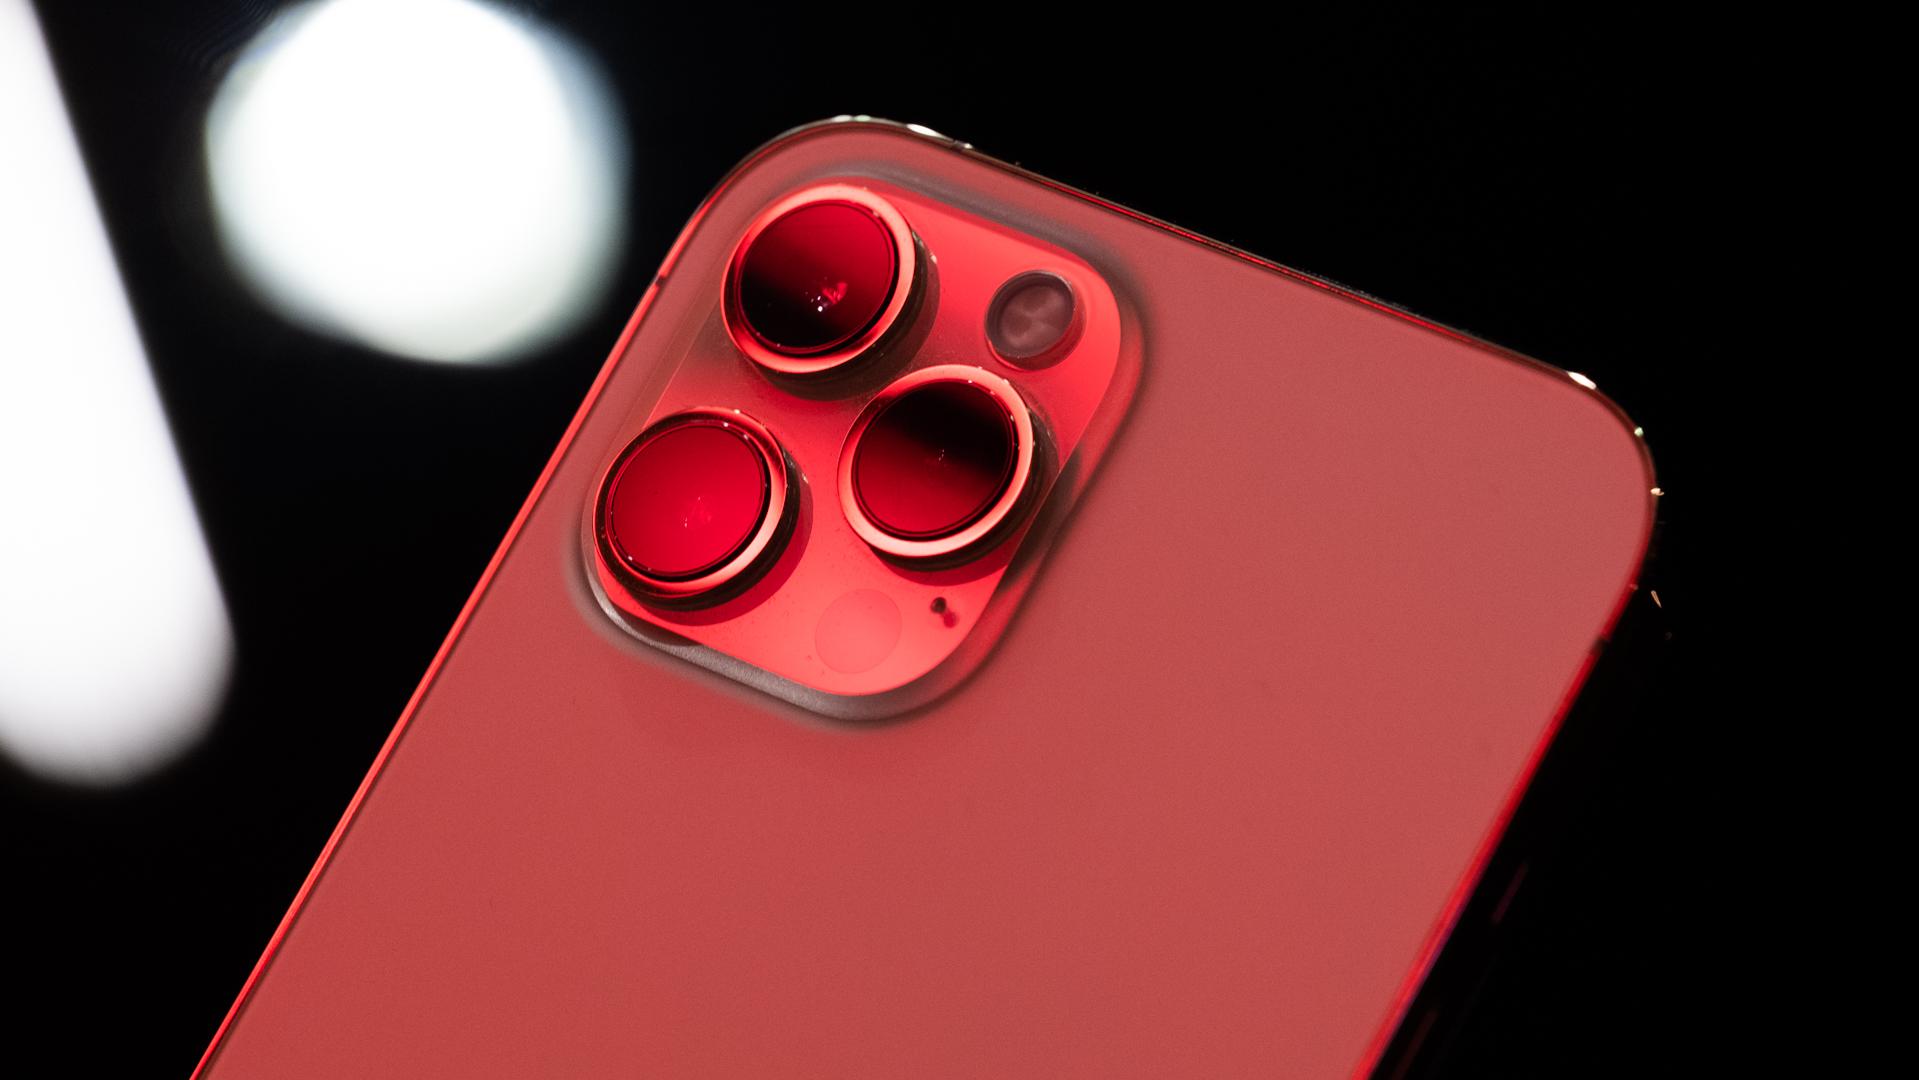 iPhone 12 Pro Max neon camera macro 6